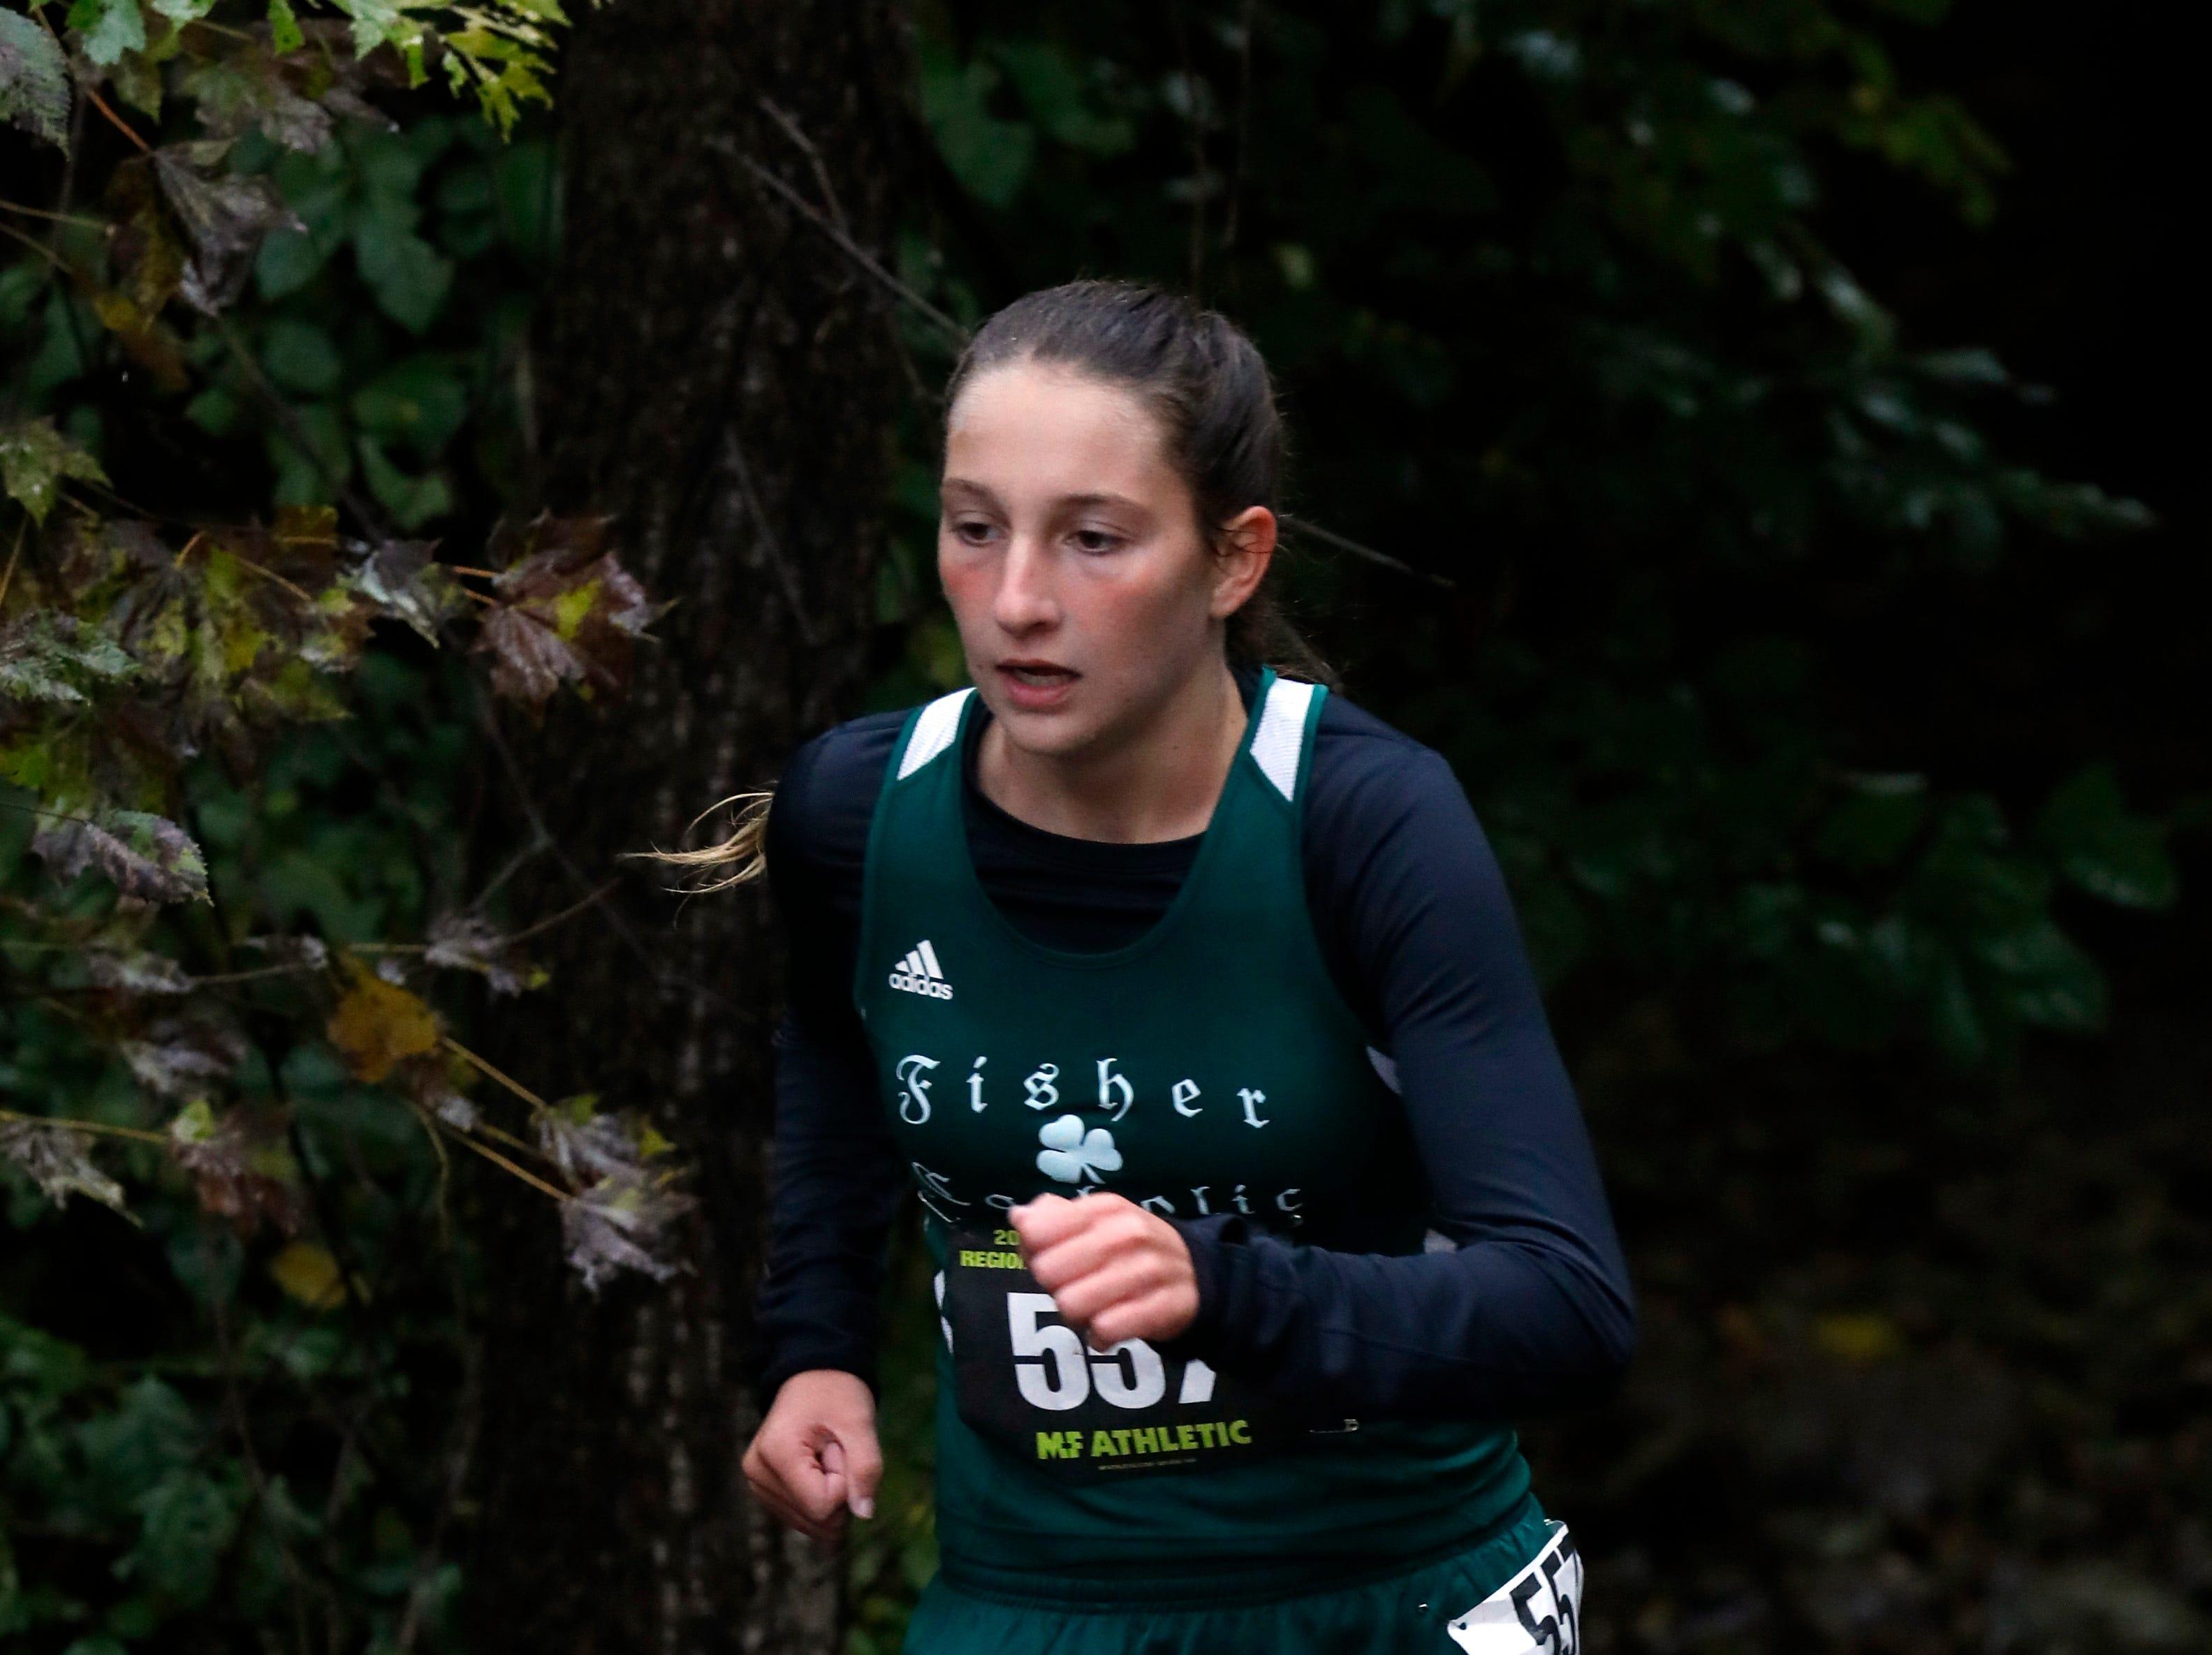 Fisher Catholic's Natalie Boyden runs in the Regional Cross Country meet Saturday, Oct. 27, 2018, at Pickerington North High School in Pickerington.